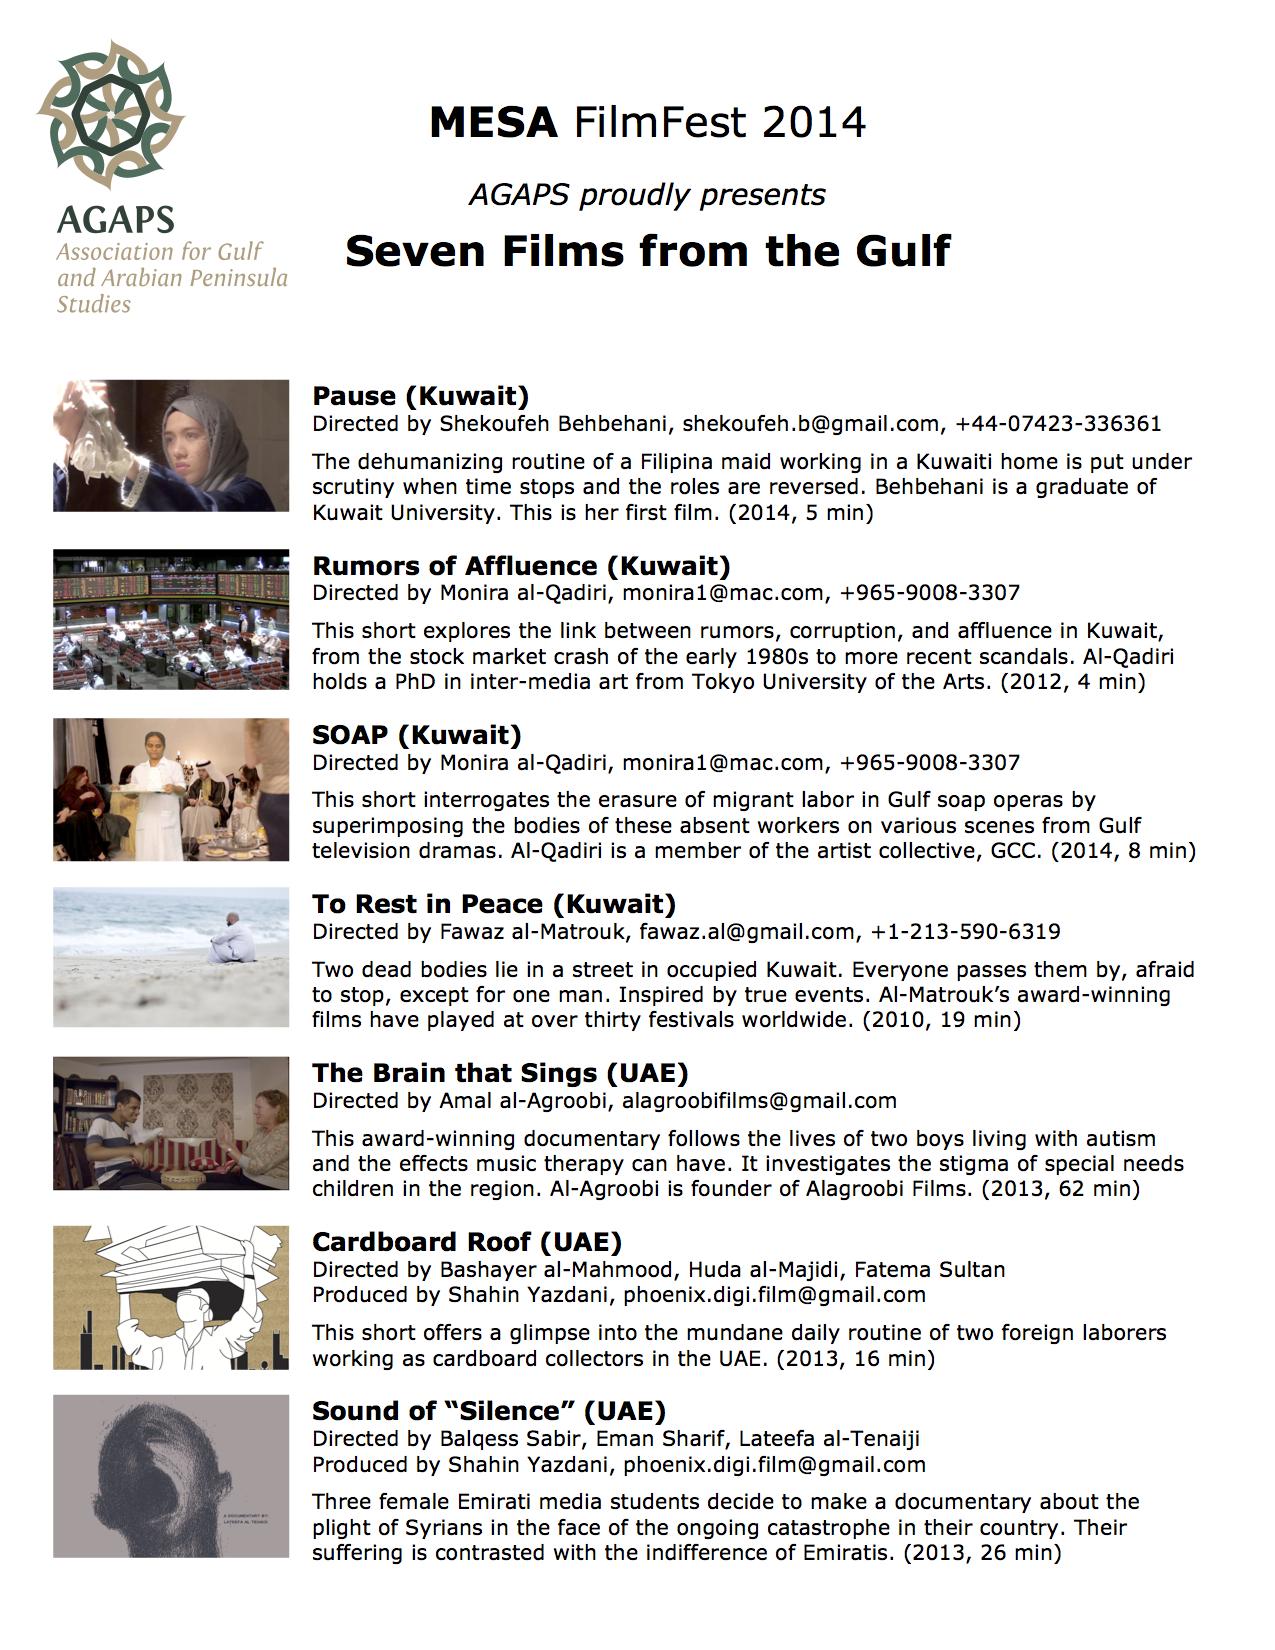 AGAPS 2014 Sell Sheet